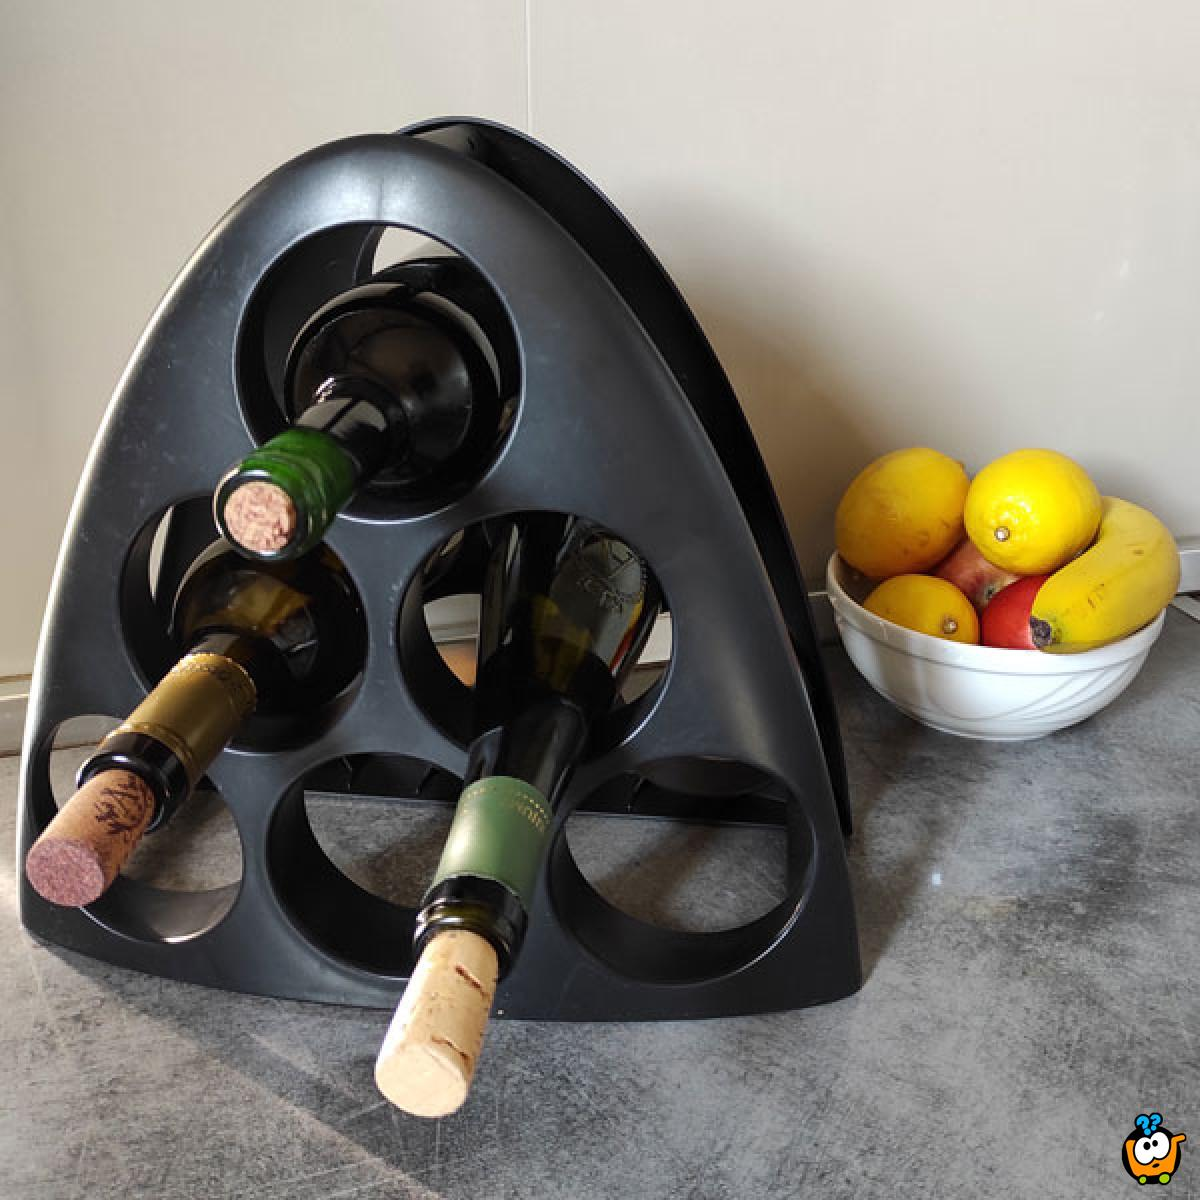 Wine rack - šestostruki stalak za vina